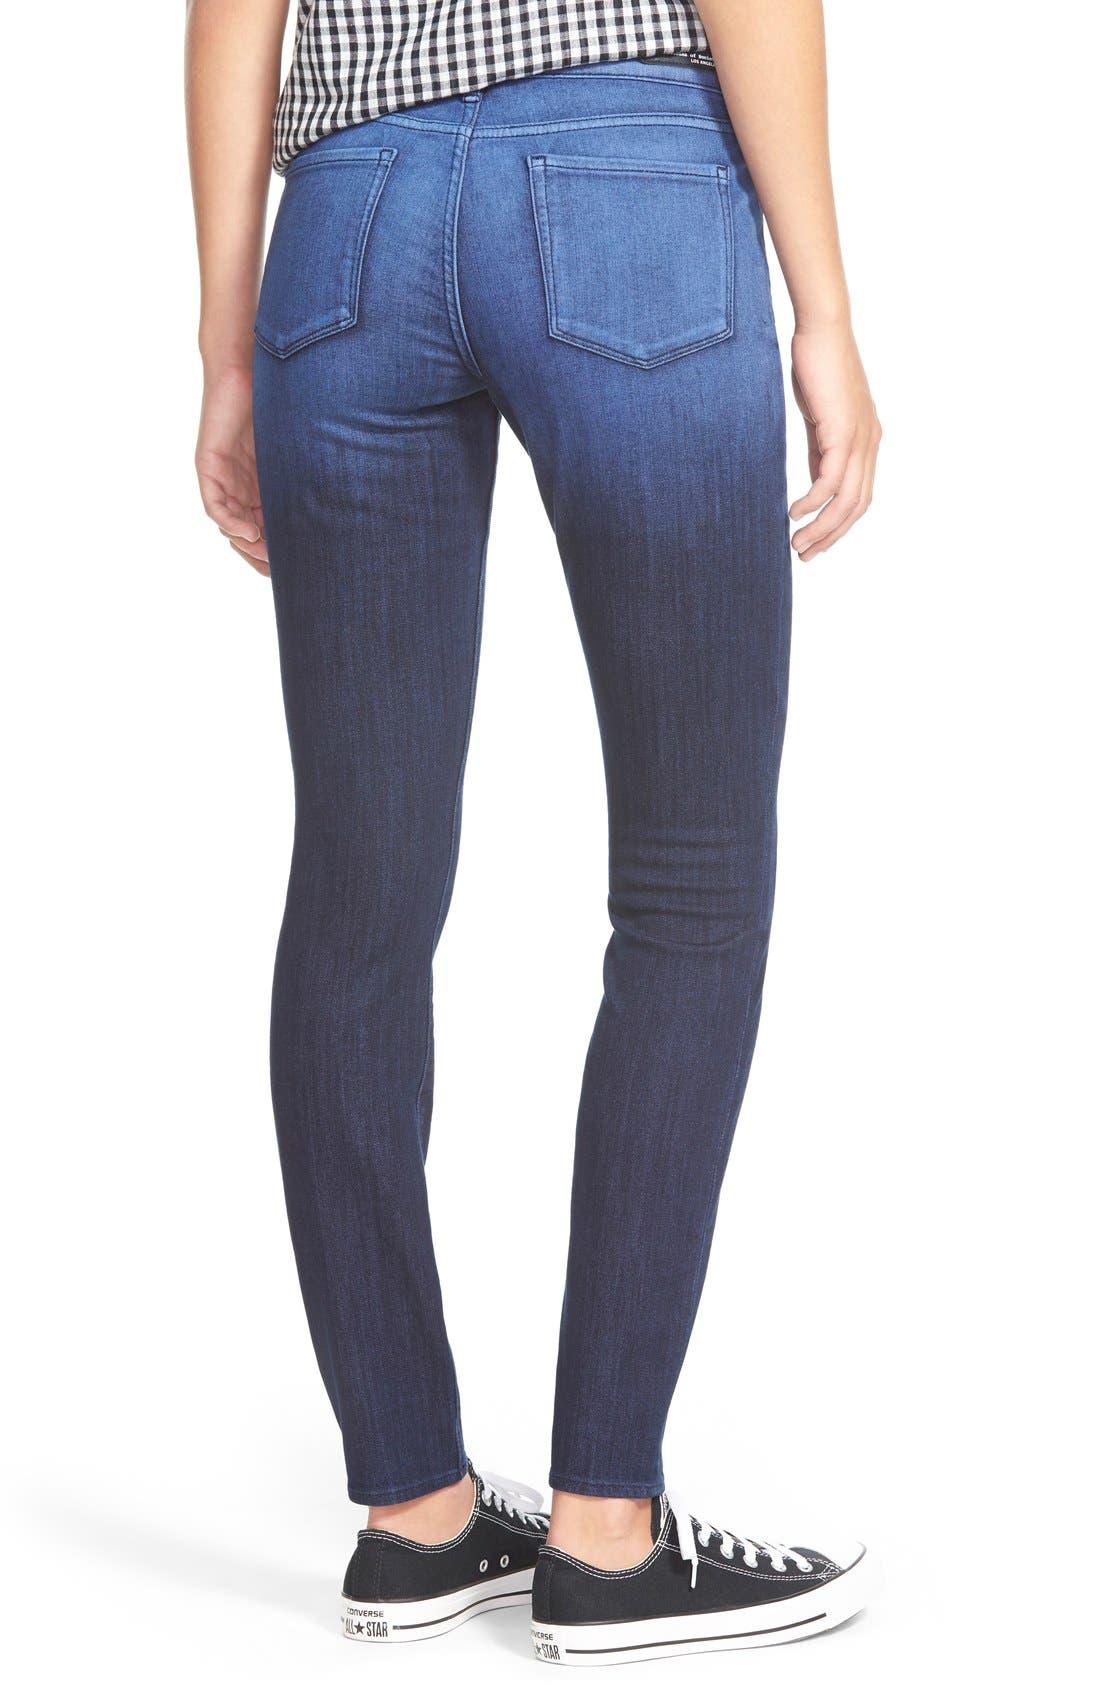 Alternate Image 2  - Articles of Society Red Label 'SoHo' Skinny Jeans (Broadwick)